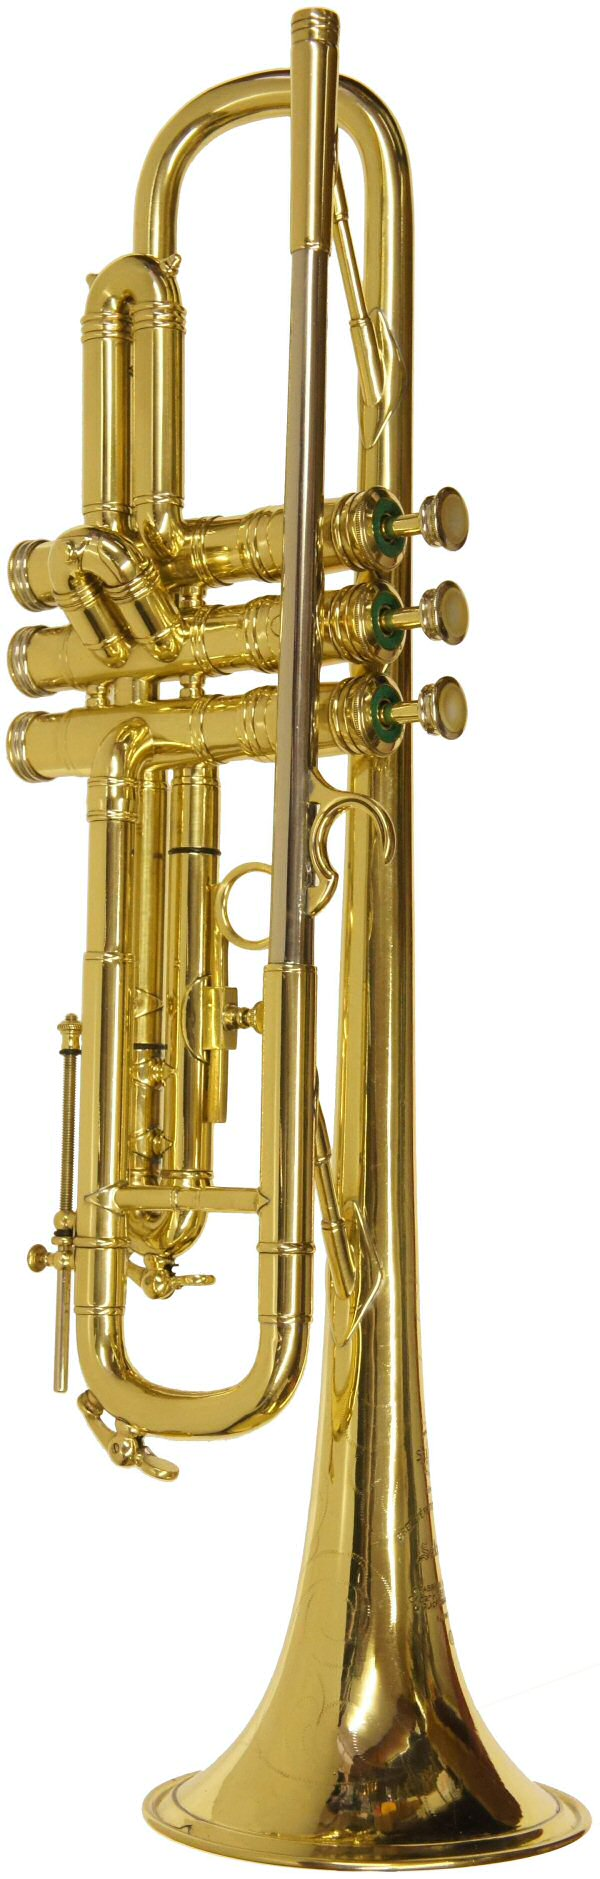 Selmer Trumpet C1958